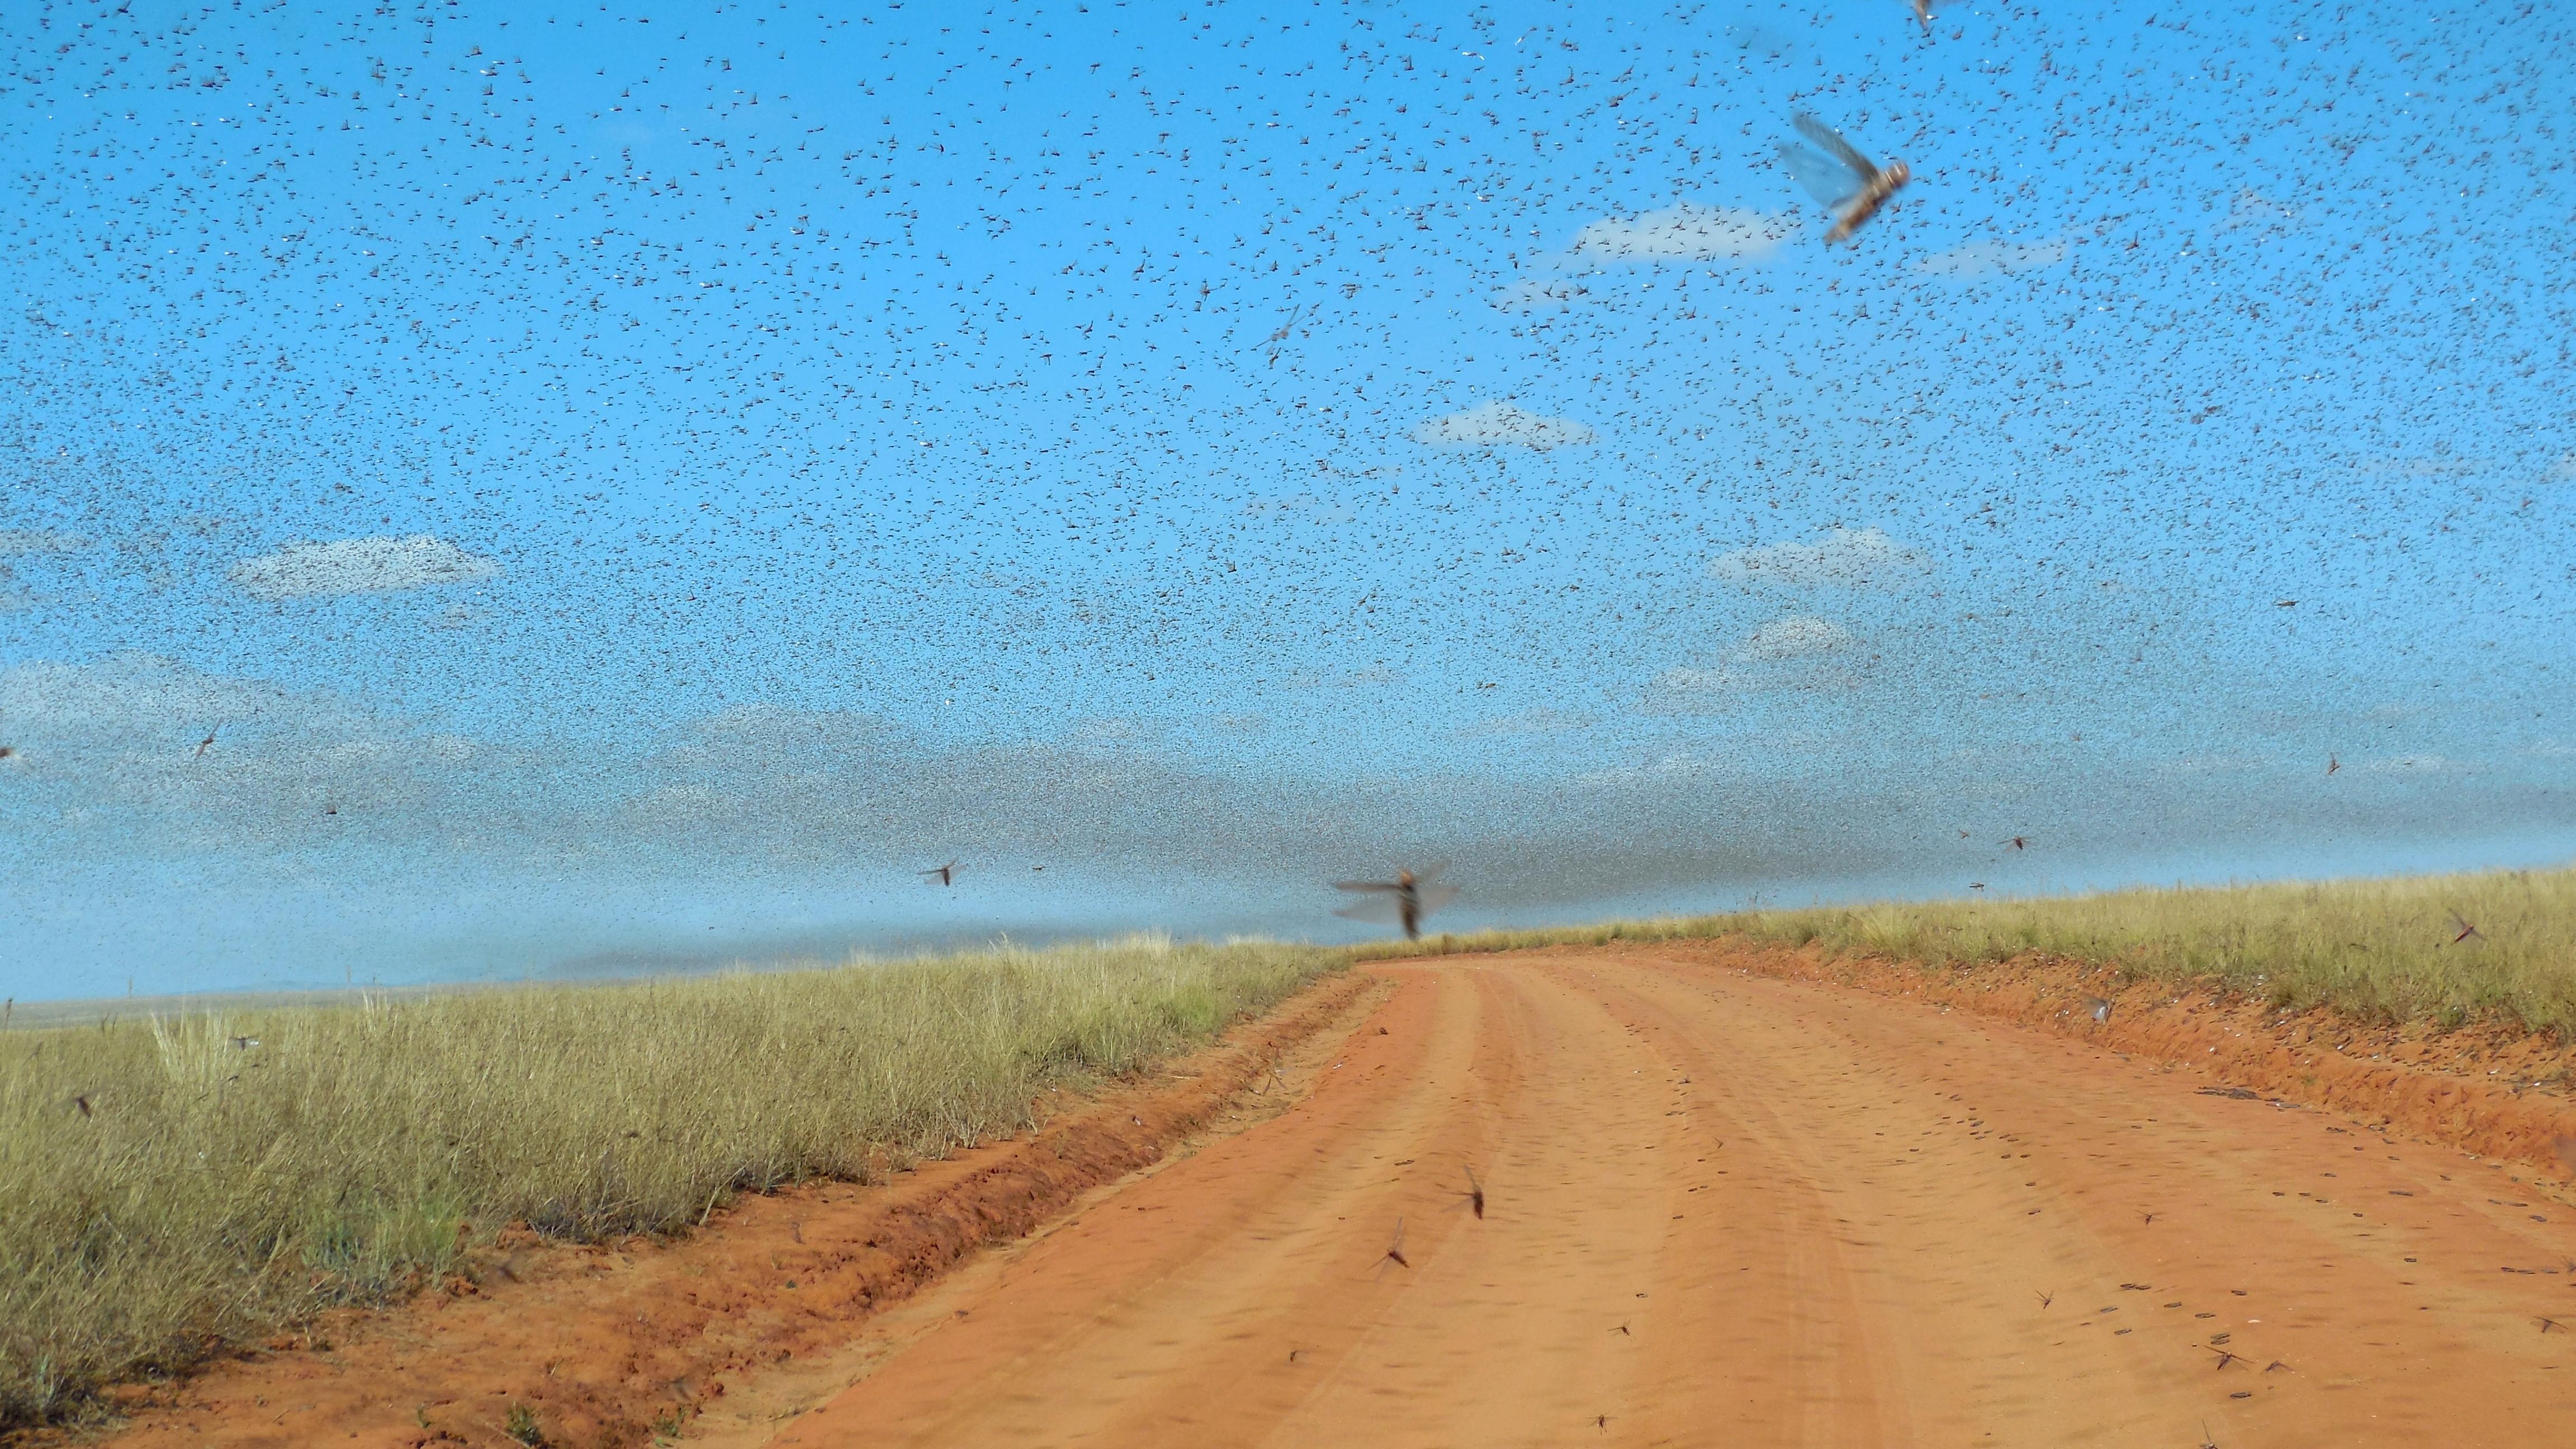 Kenya Braces for Returning Locust Plague Outbreak